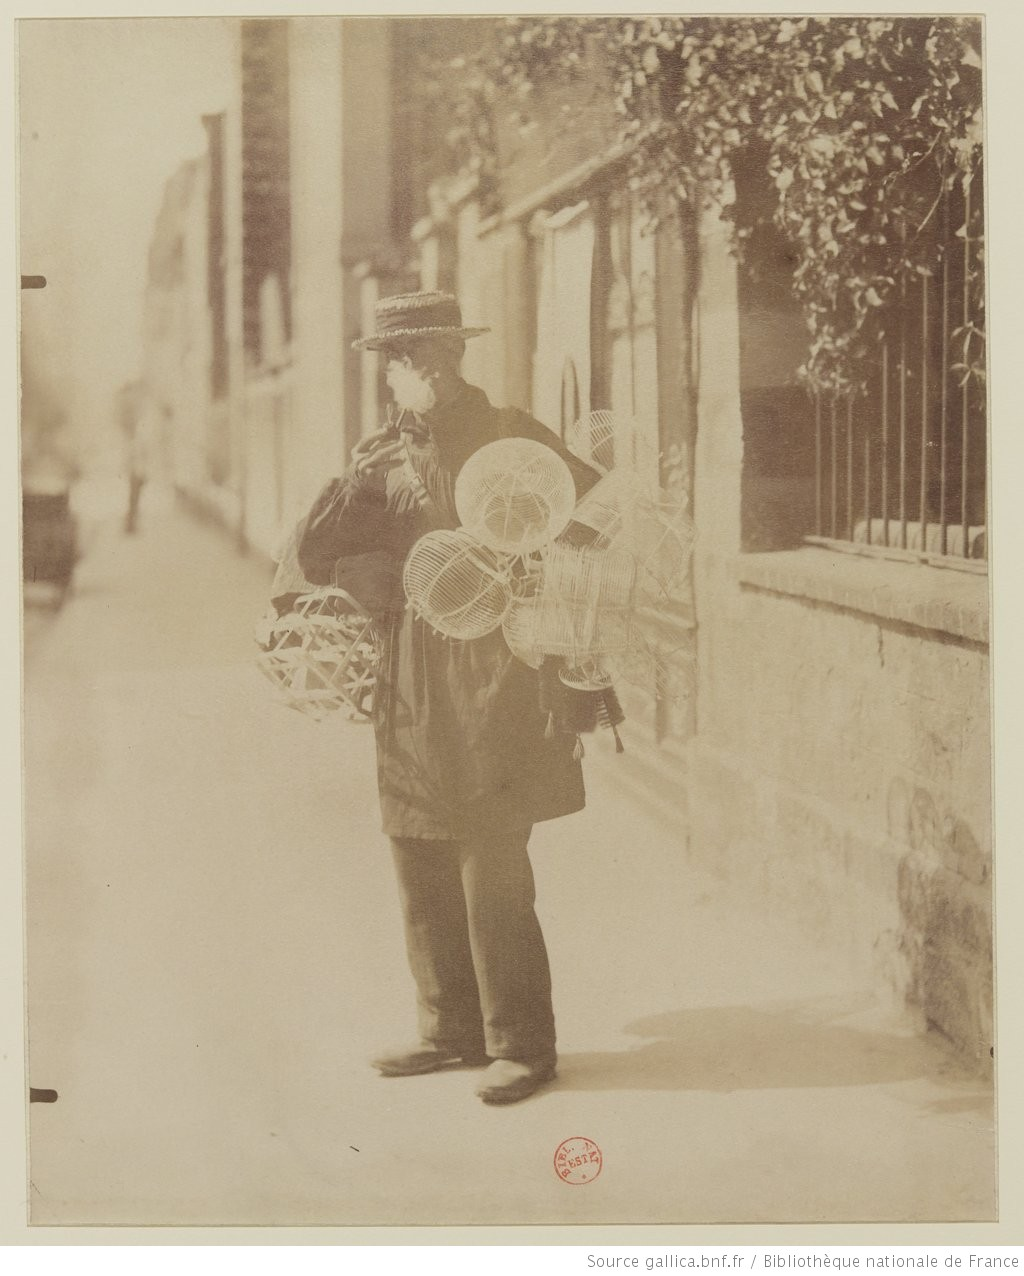 Eugène ATGET, Marchand d'ustensiles de ménage, 1899